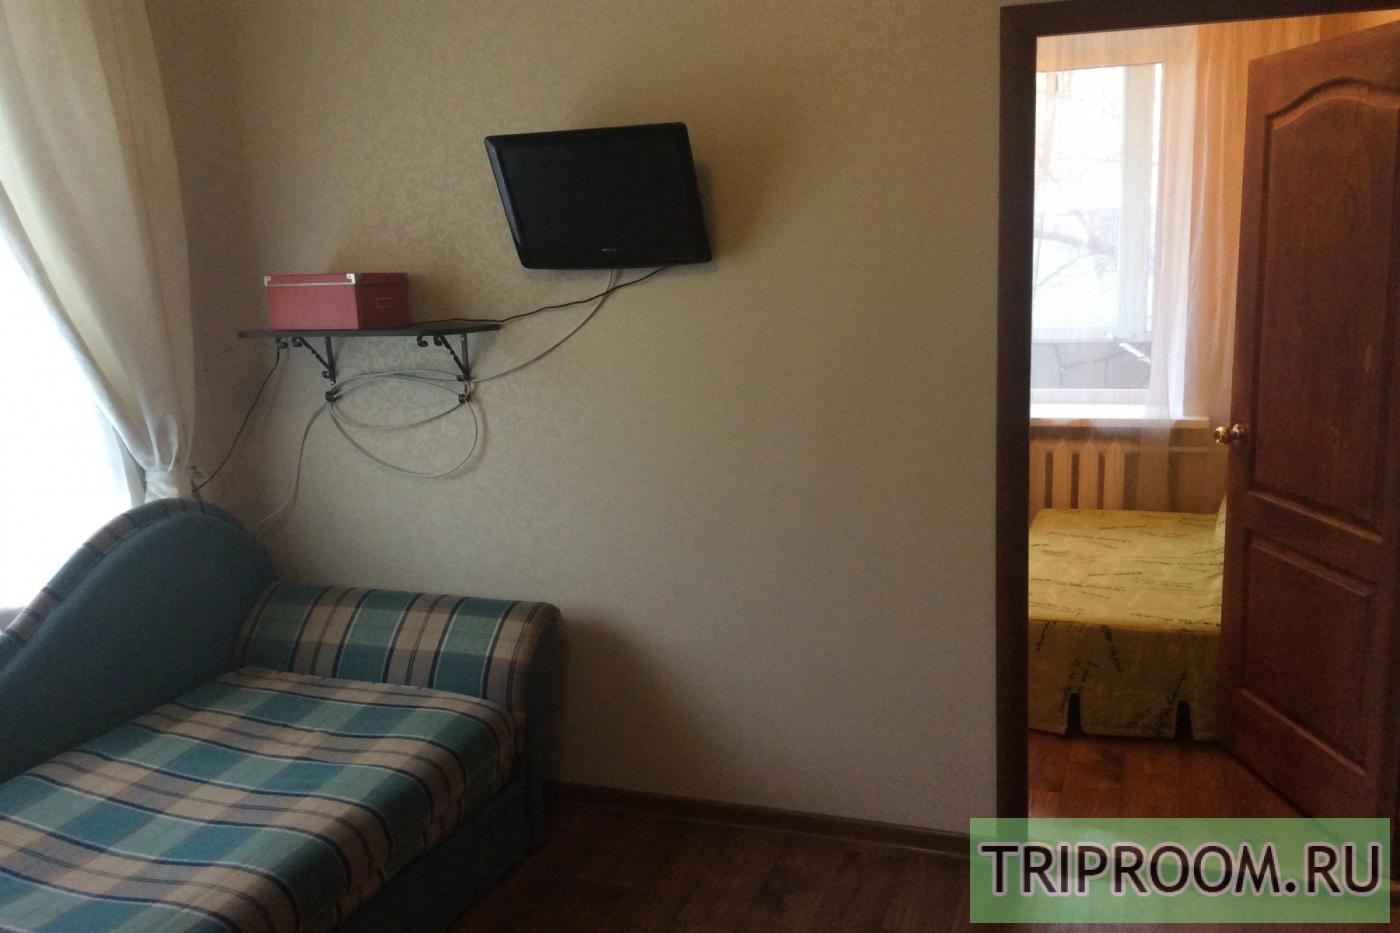 2-комнатная квартира посуточно (вариант № 23910), ул. М. Нагибина проспект, фото № 1